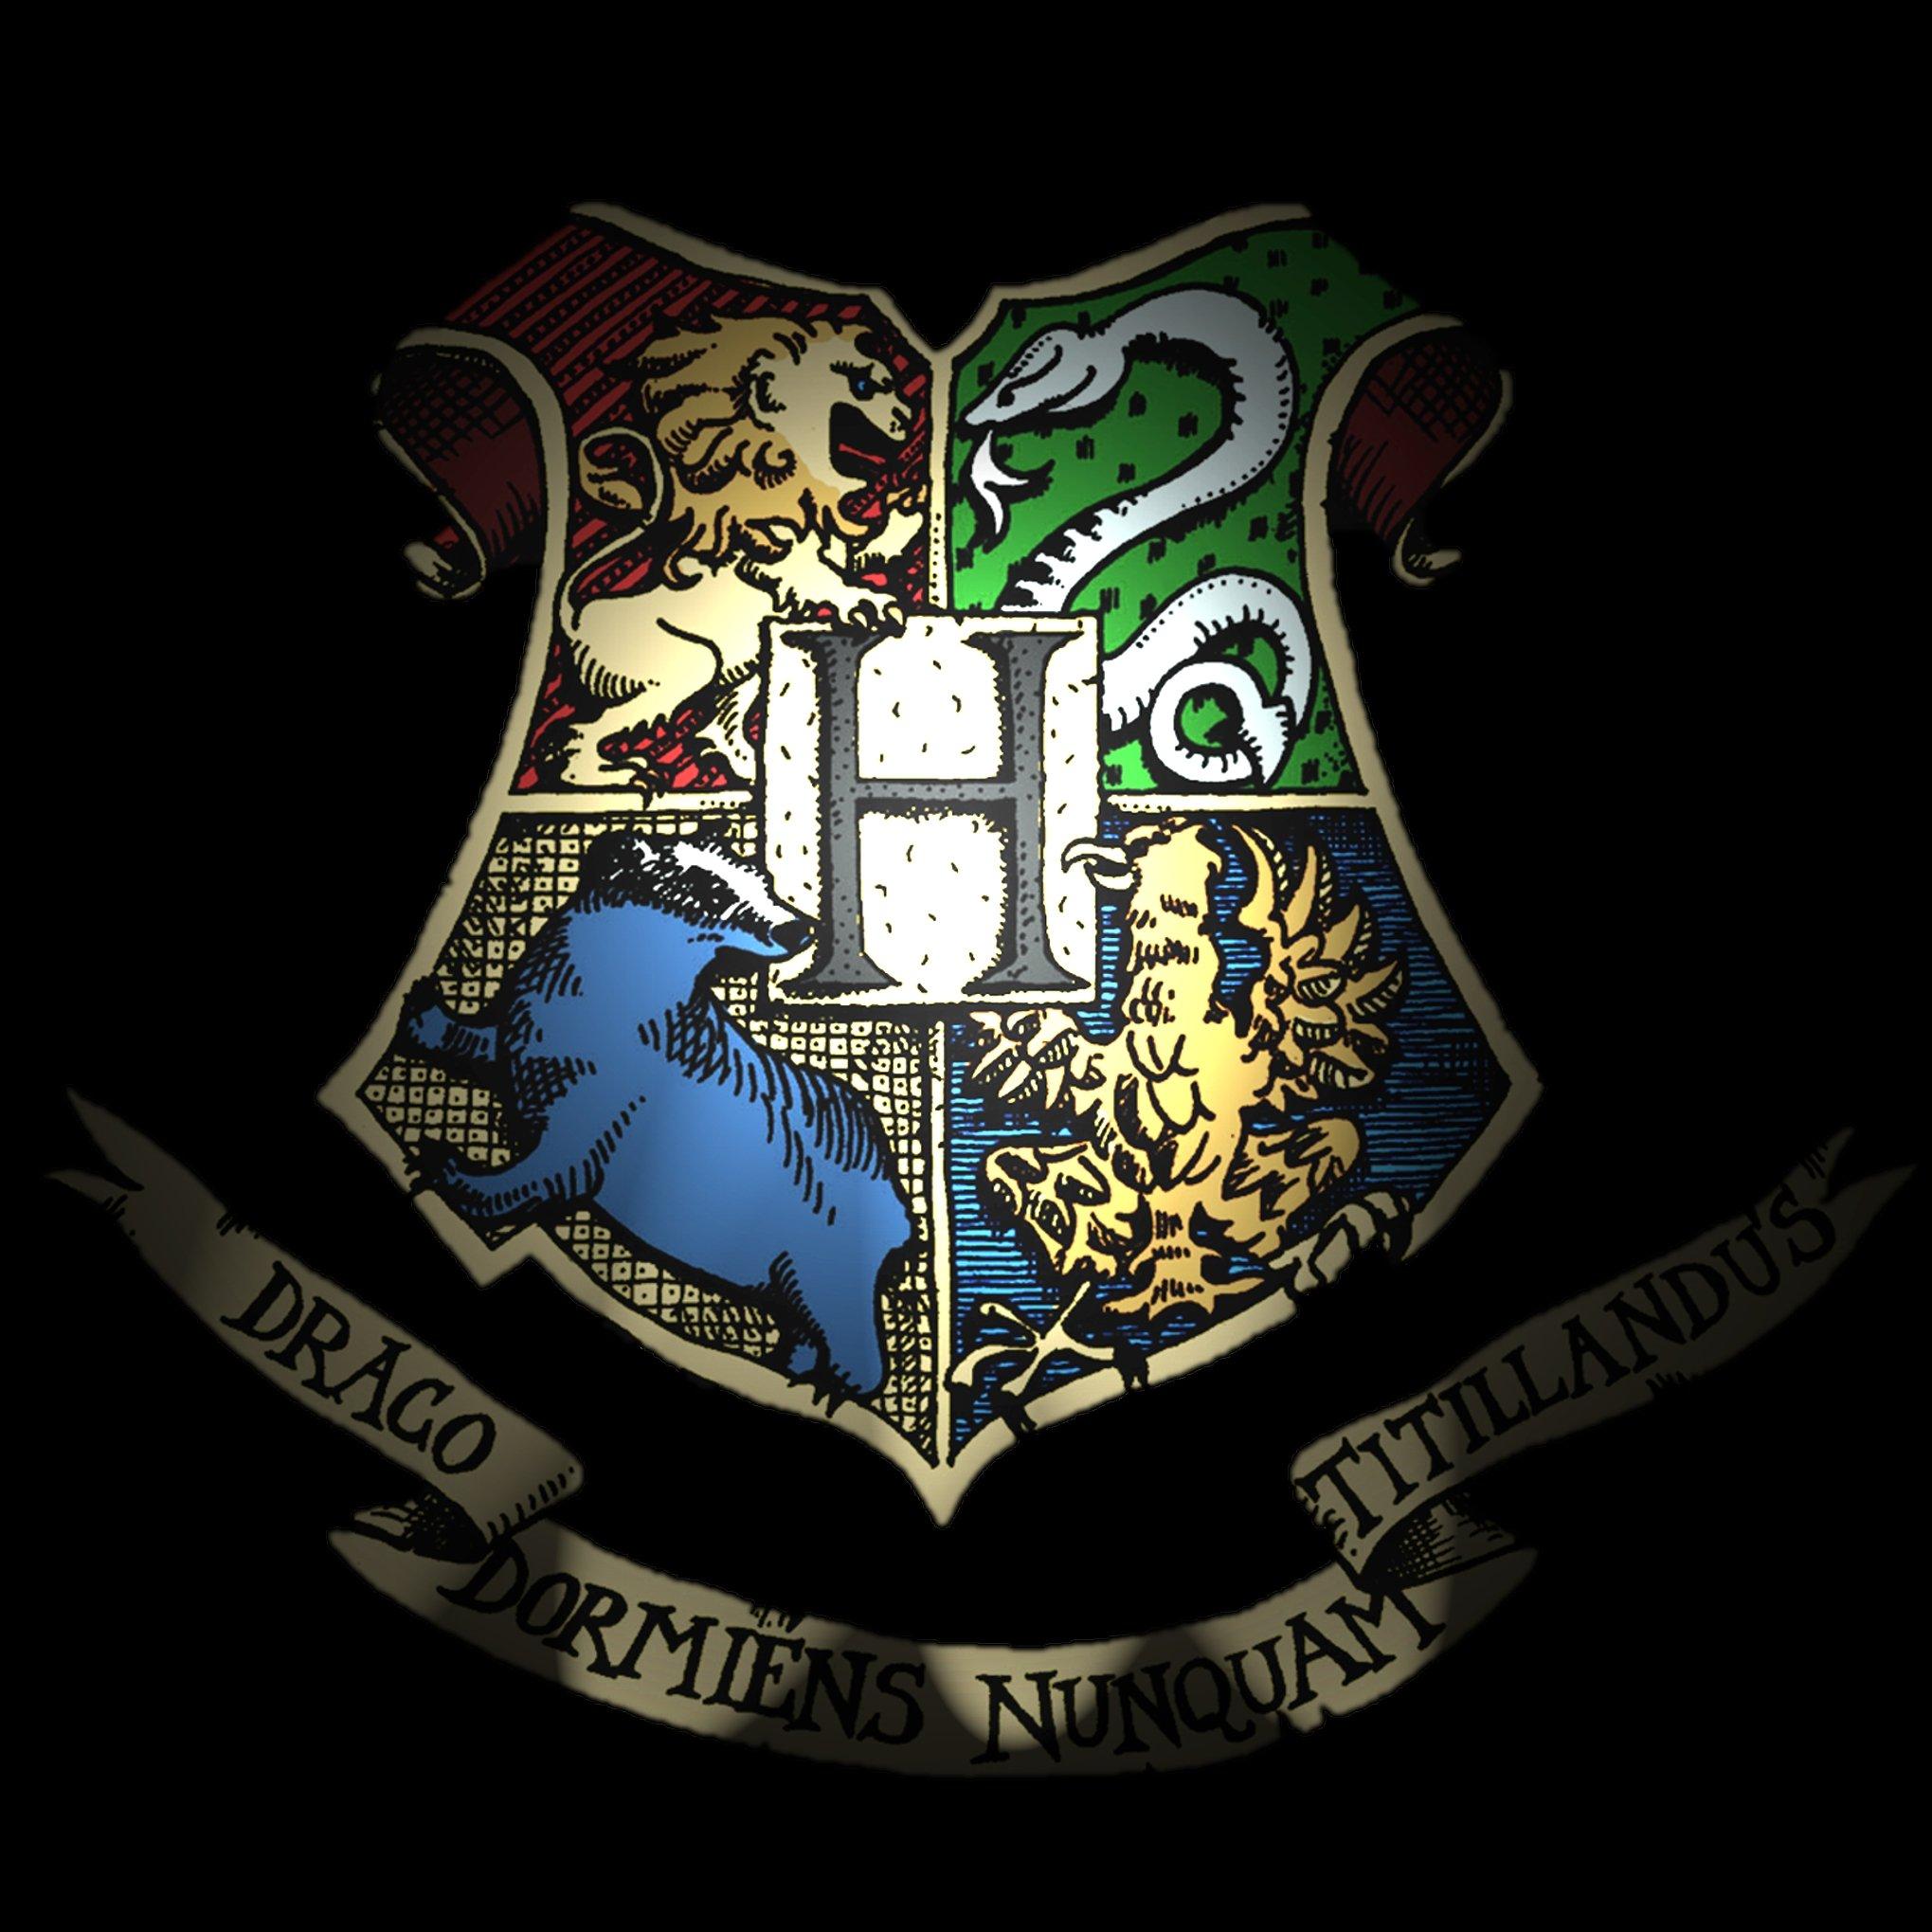 related harry potter hogwarts crest wallpaper harry potter hogwarts 2039x2039